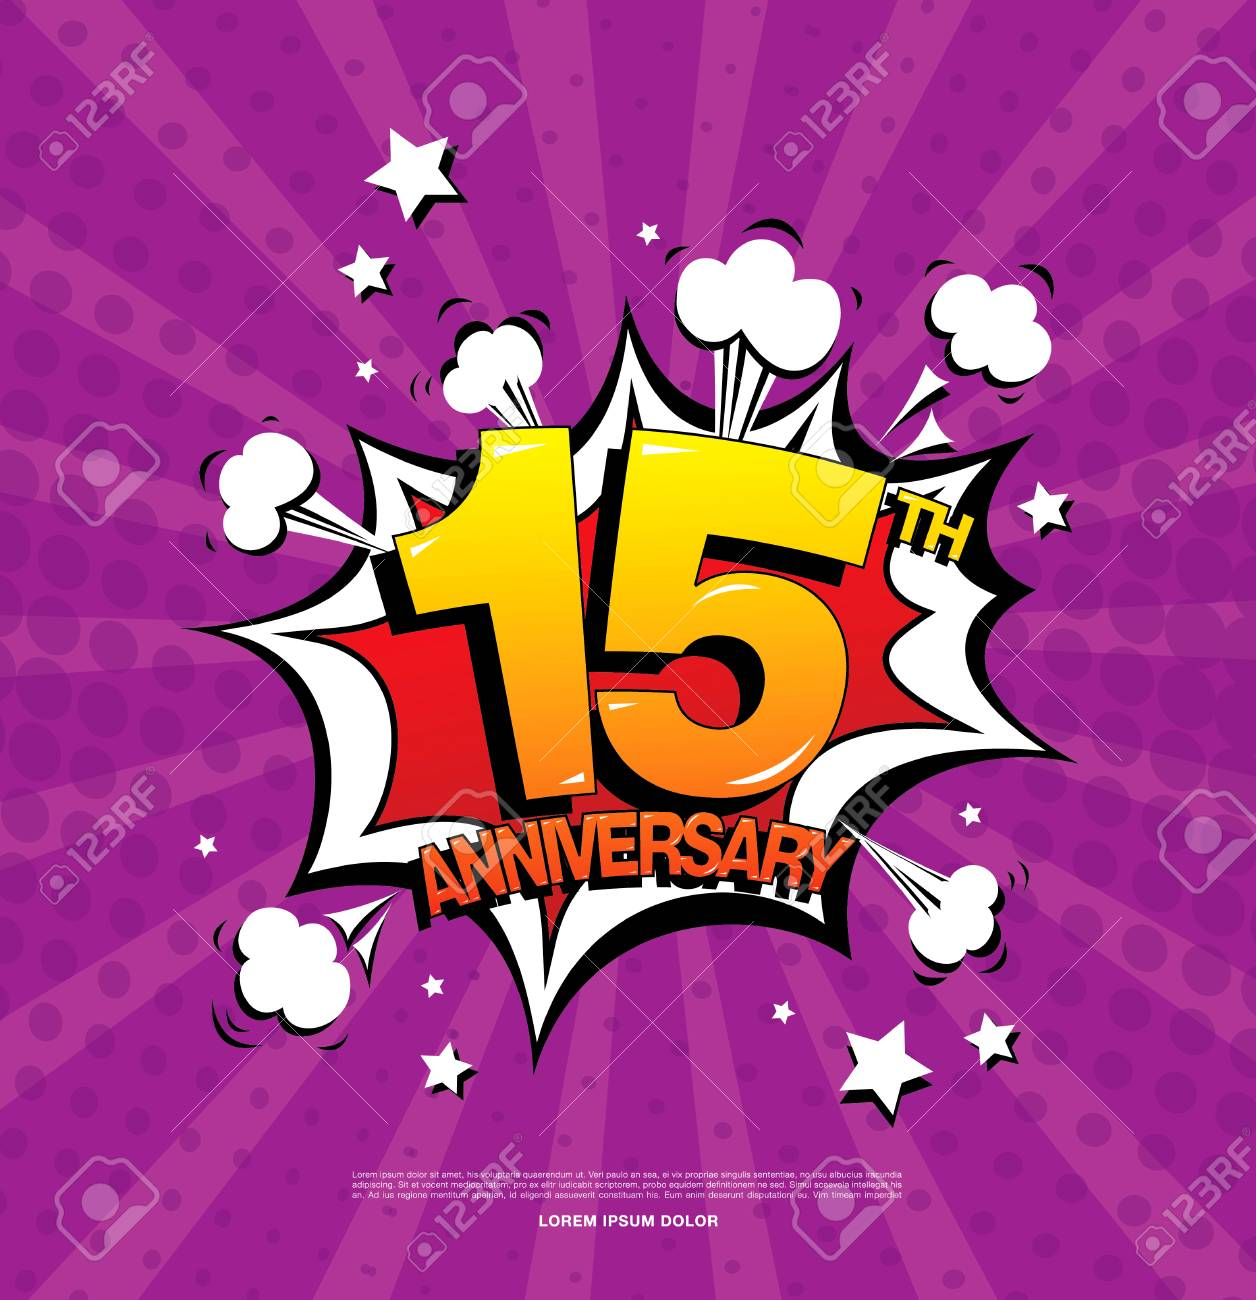 15th Anniversary Emblem Fifteen Years Anniversary Celebration